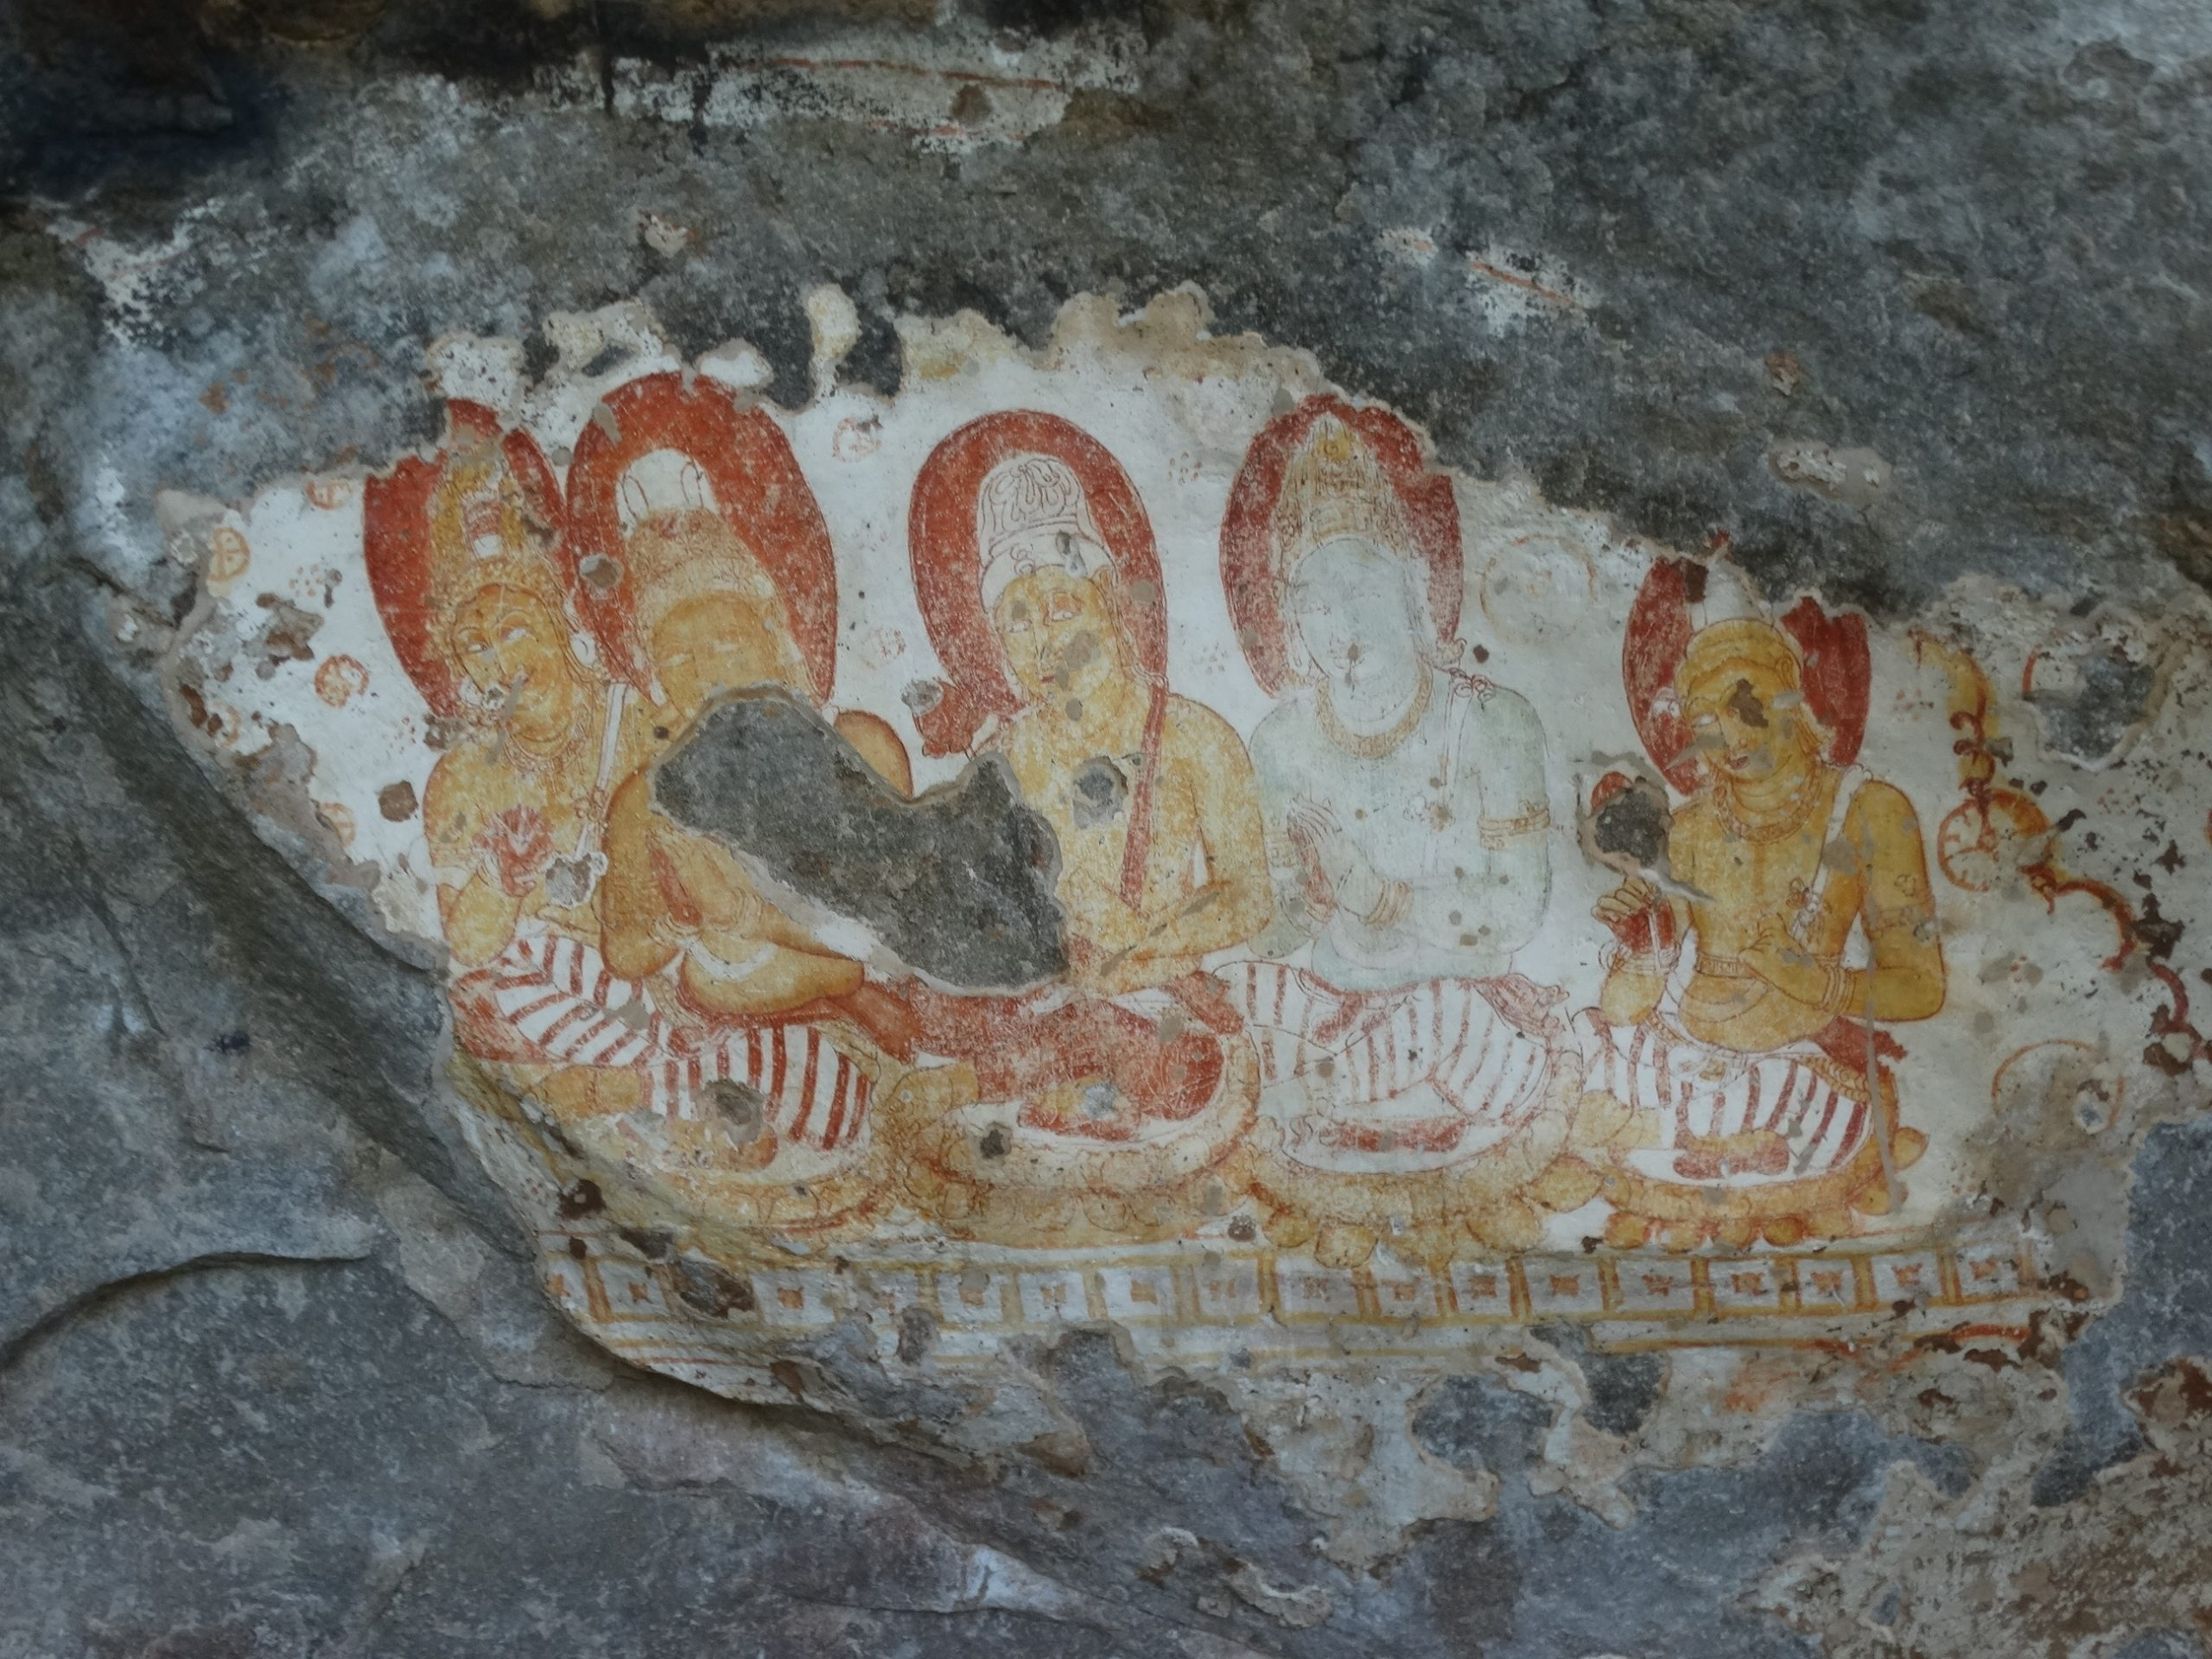 Archaeological Sites around Dimbulagala: Part 02